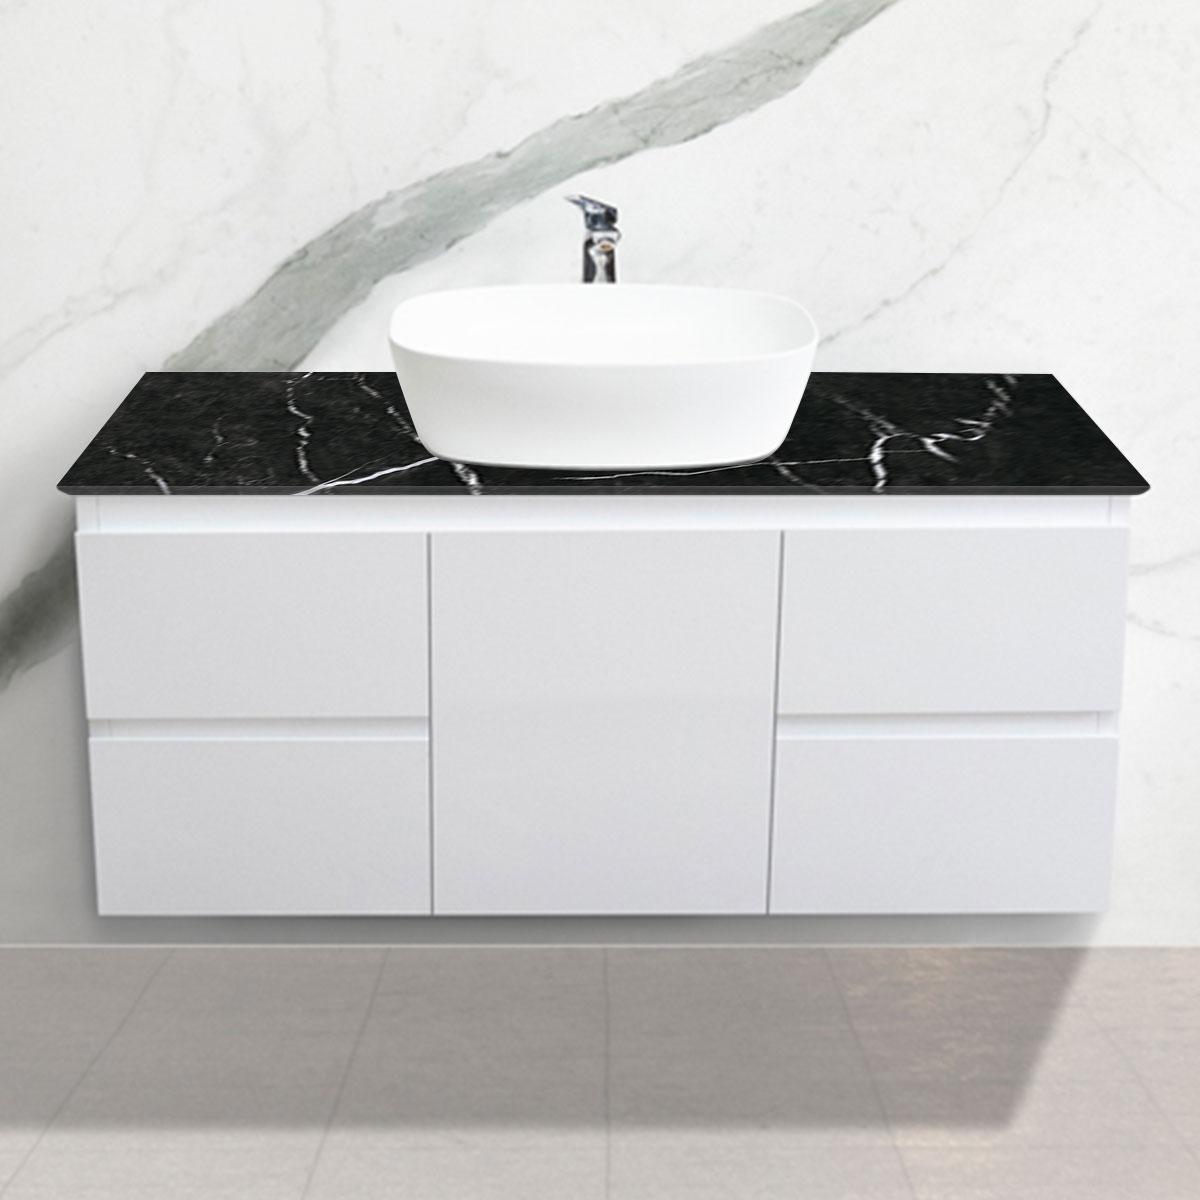 Cabinet - Vanity- 1 Door + 4 Drawers - Nero Marquina - Stone3 Brisbane